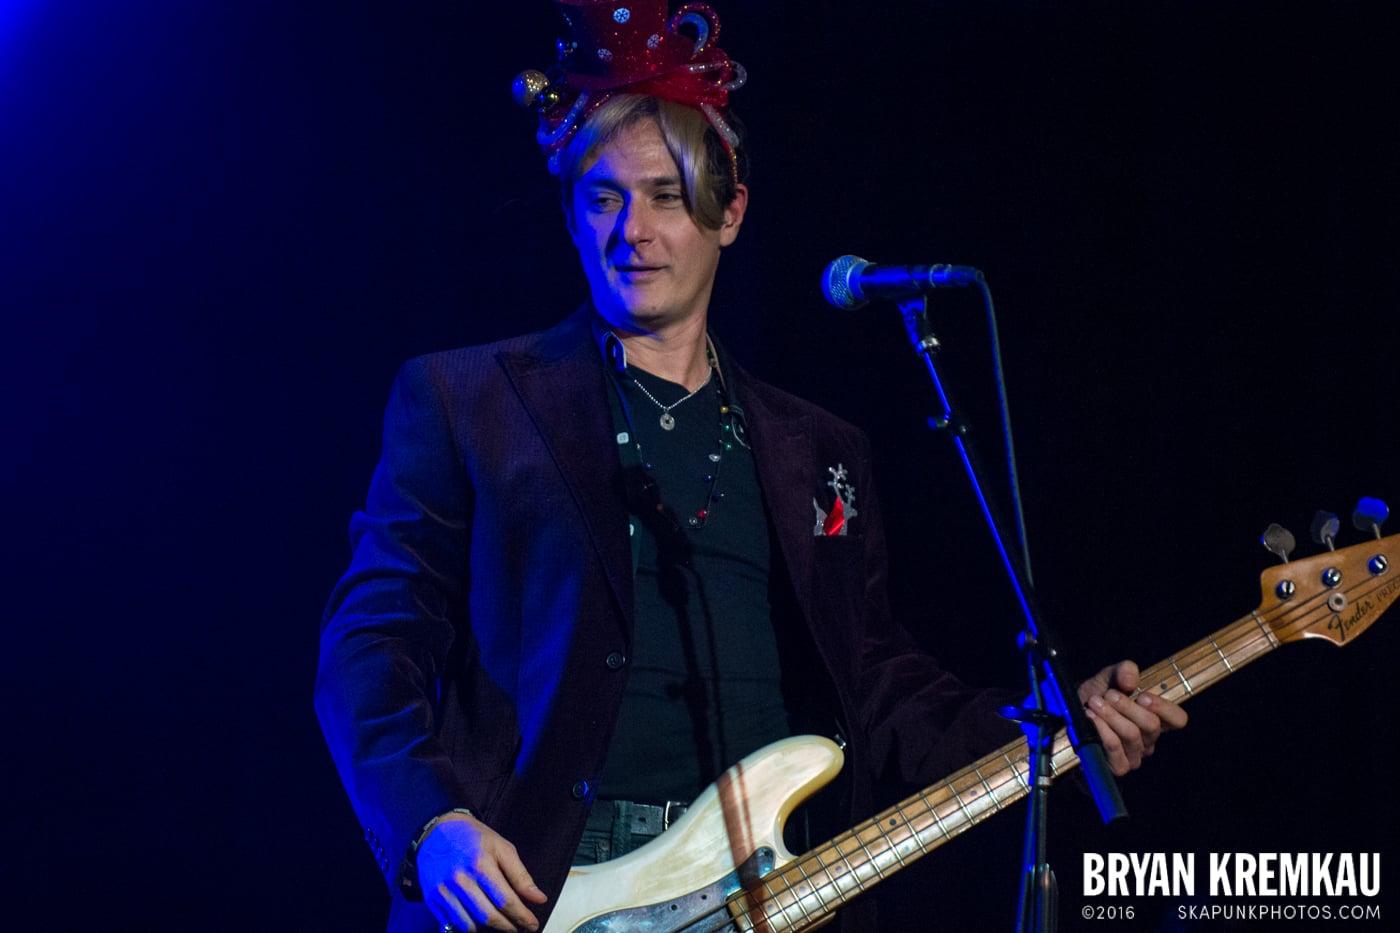 Willie Nile @ Highline Ballroom, NYC - 12.26.14 (56)